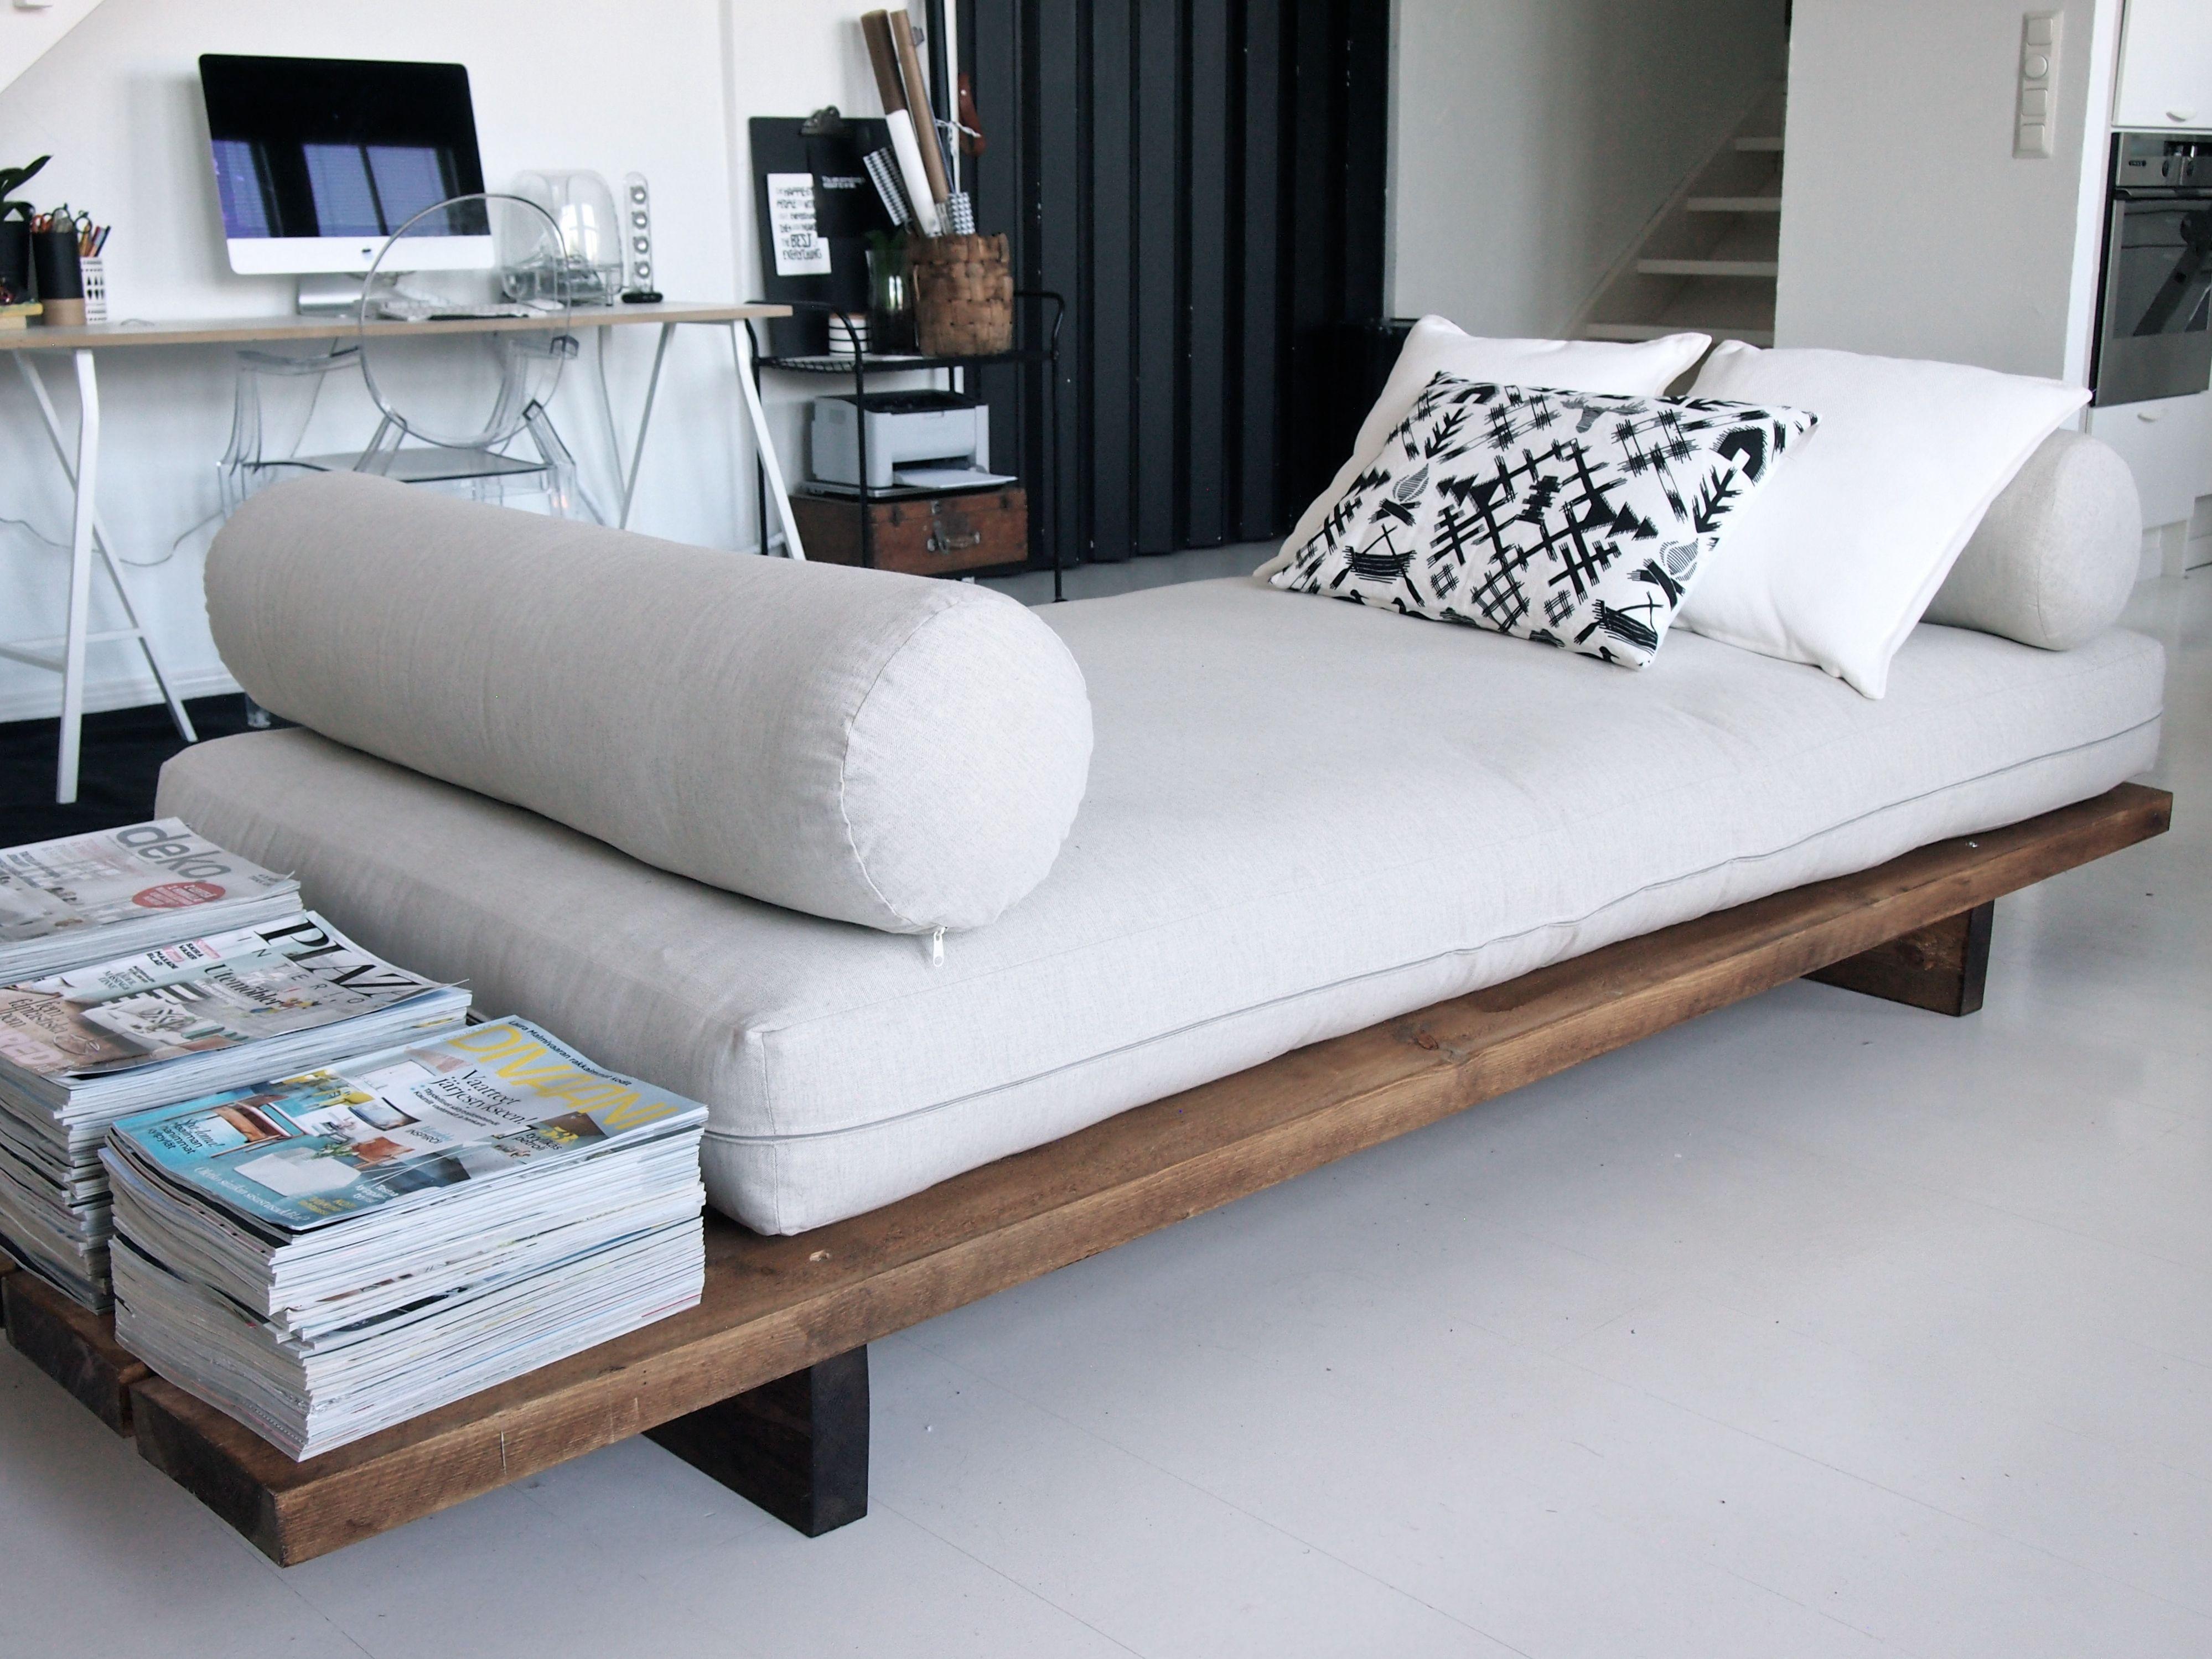 Projekti Verkaranta Blog DIY DAYBED LIVINGROOM Diy Daybed Furniture Diy Sofa